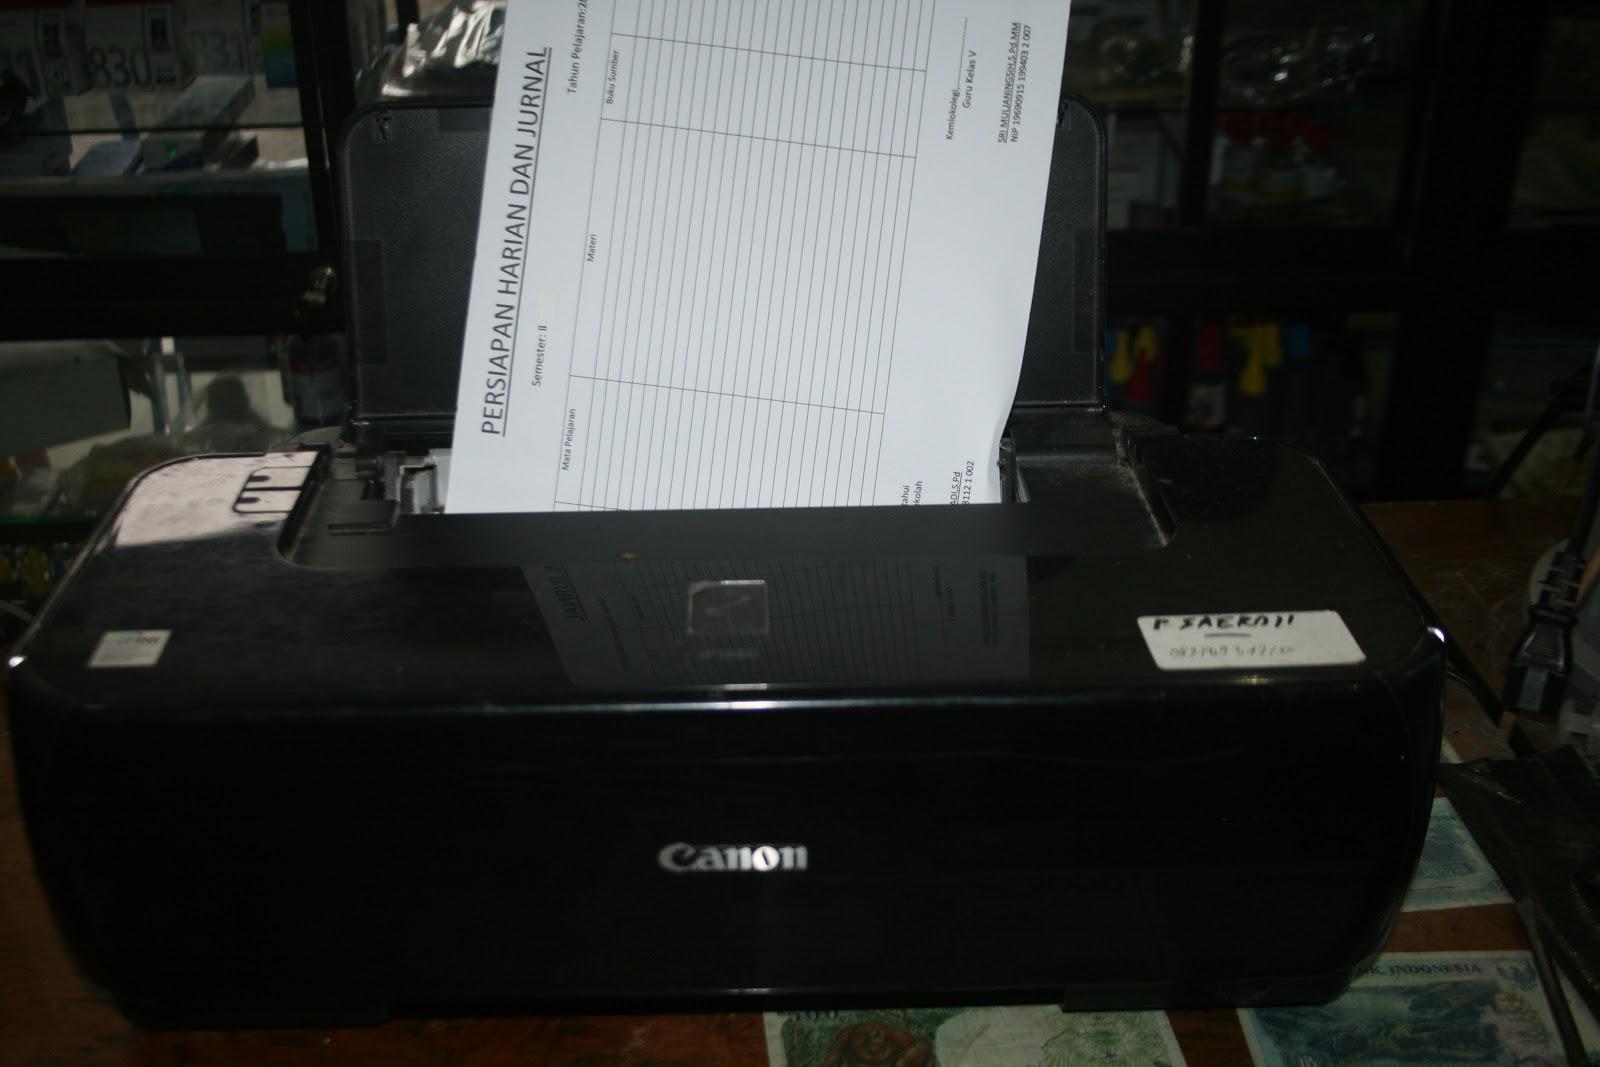 Boedjhank Crew Computer Mengatasi Printer Canon Ip 1880 Narik